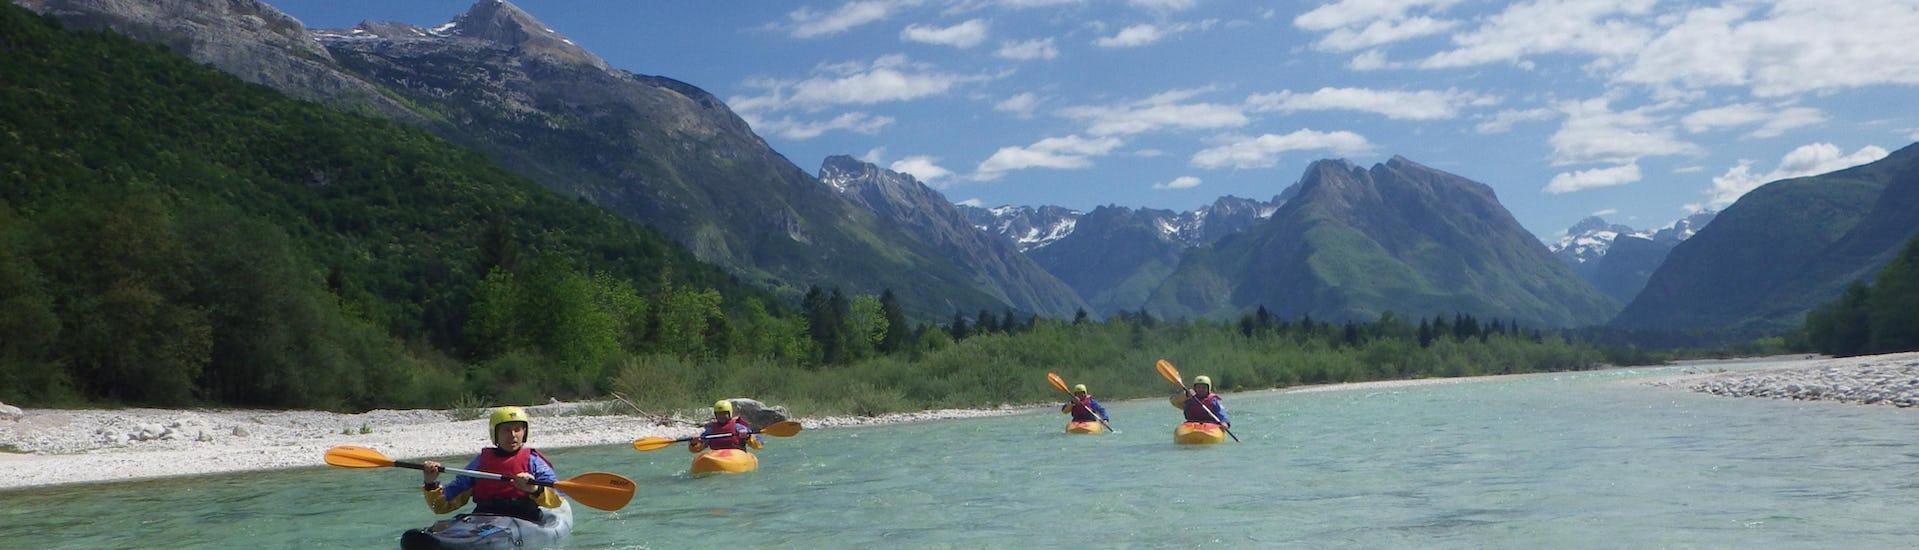 Guided Kayak Tour - Soča